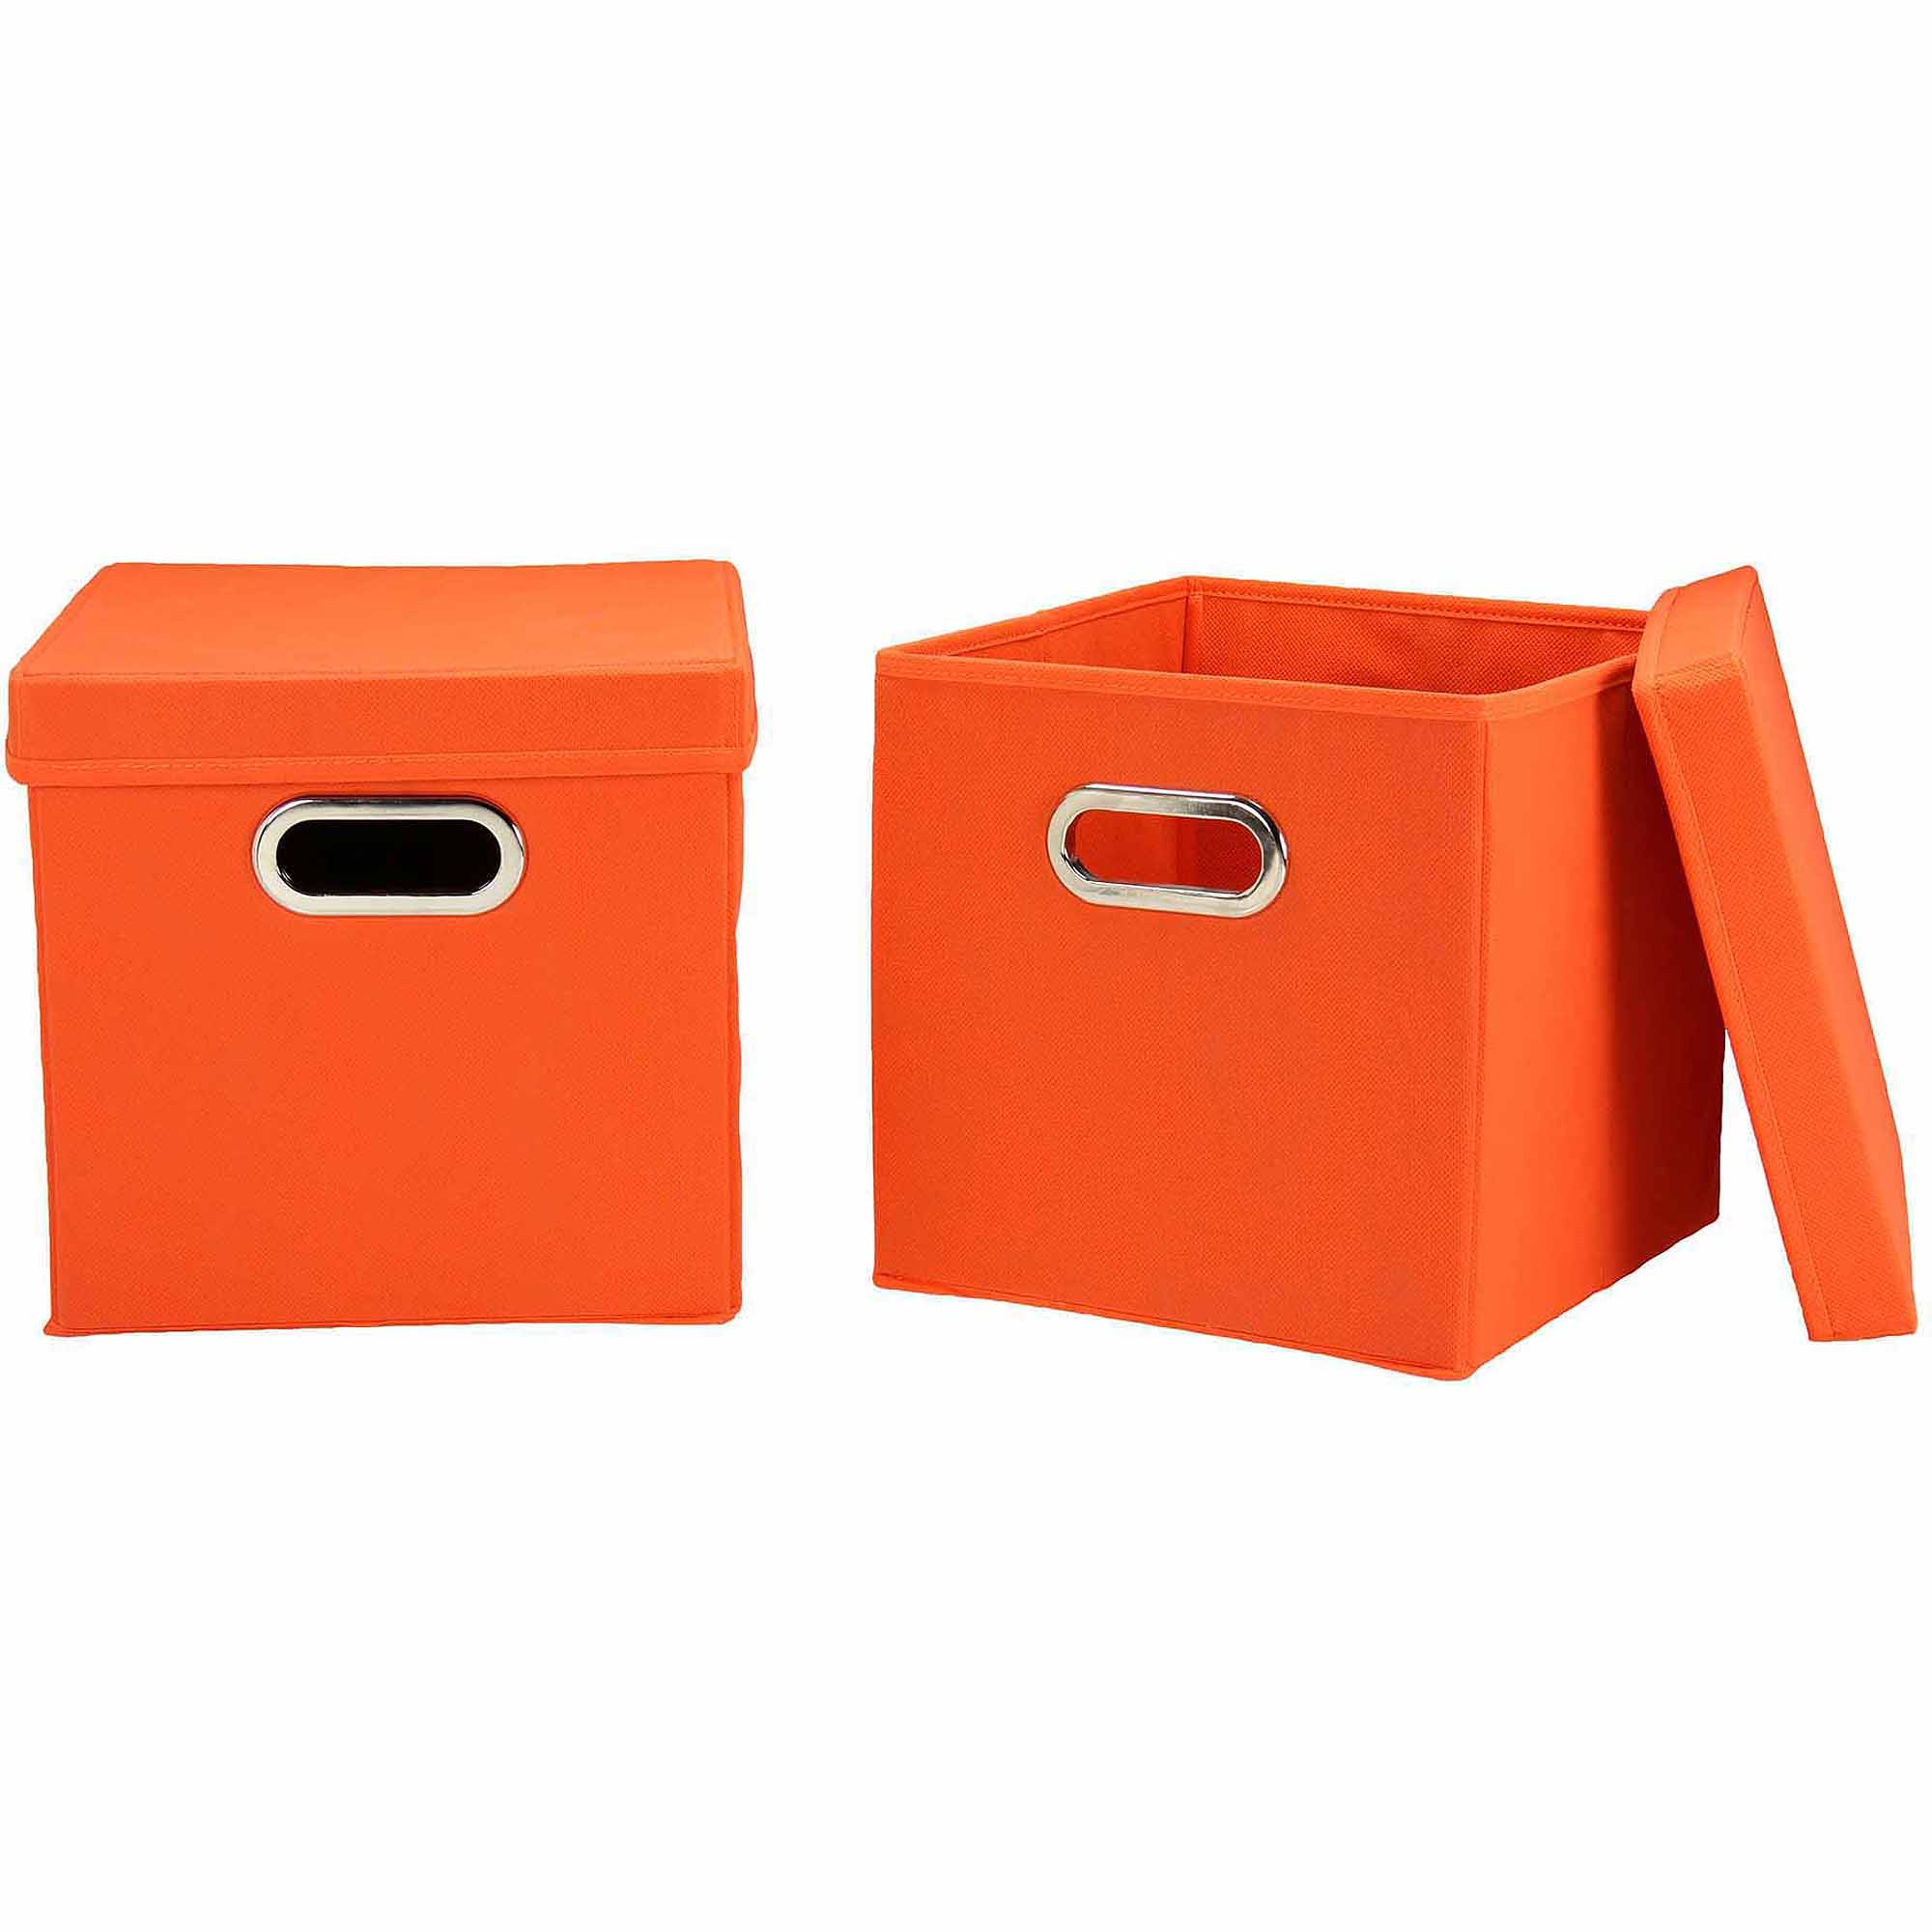 Household Essentials Orange Cube Set with Lids, 2pk